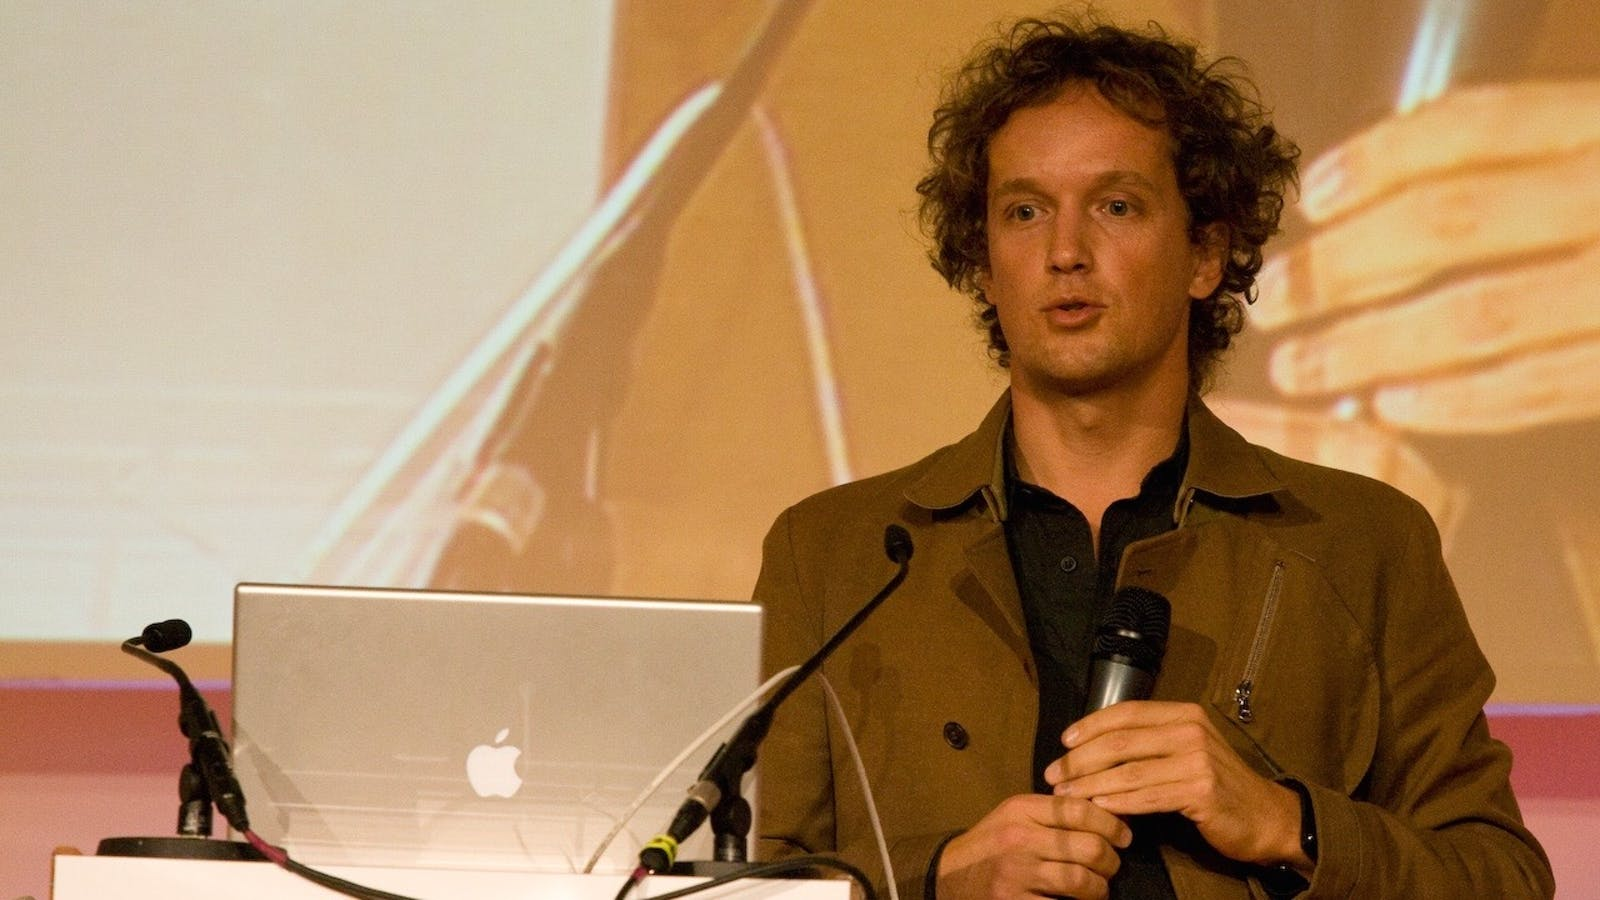 August Home co-founder Yves Behar. Photo by Flickr/Eirik Solheim.